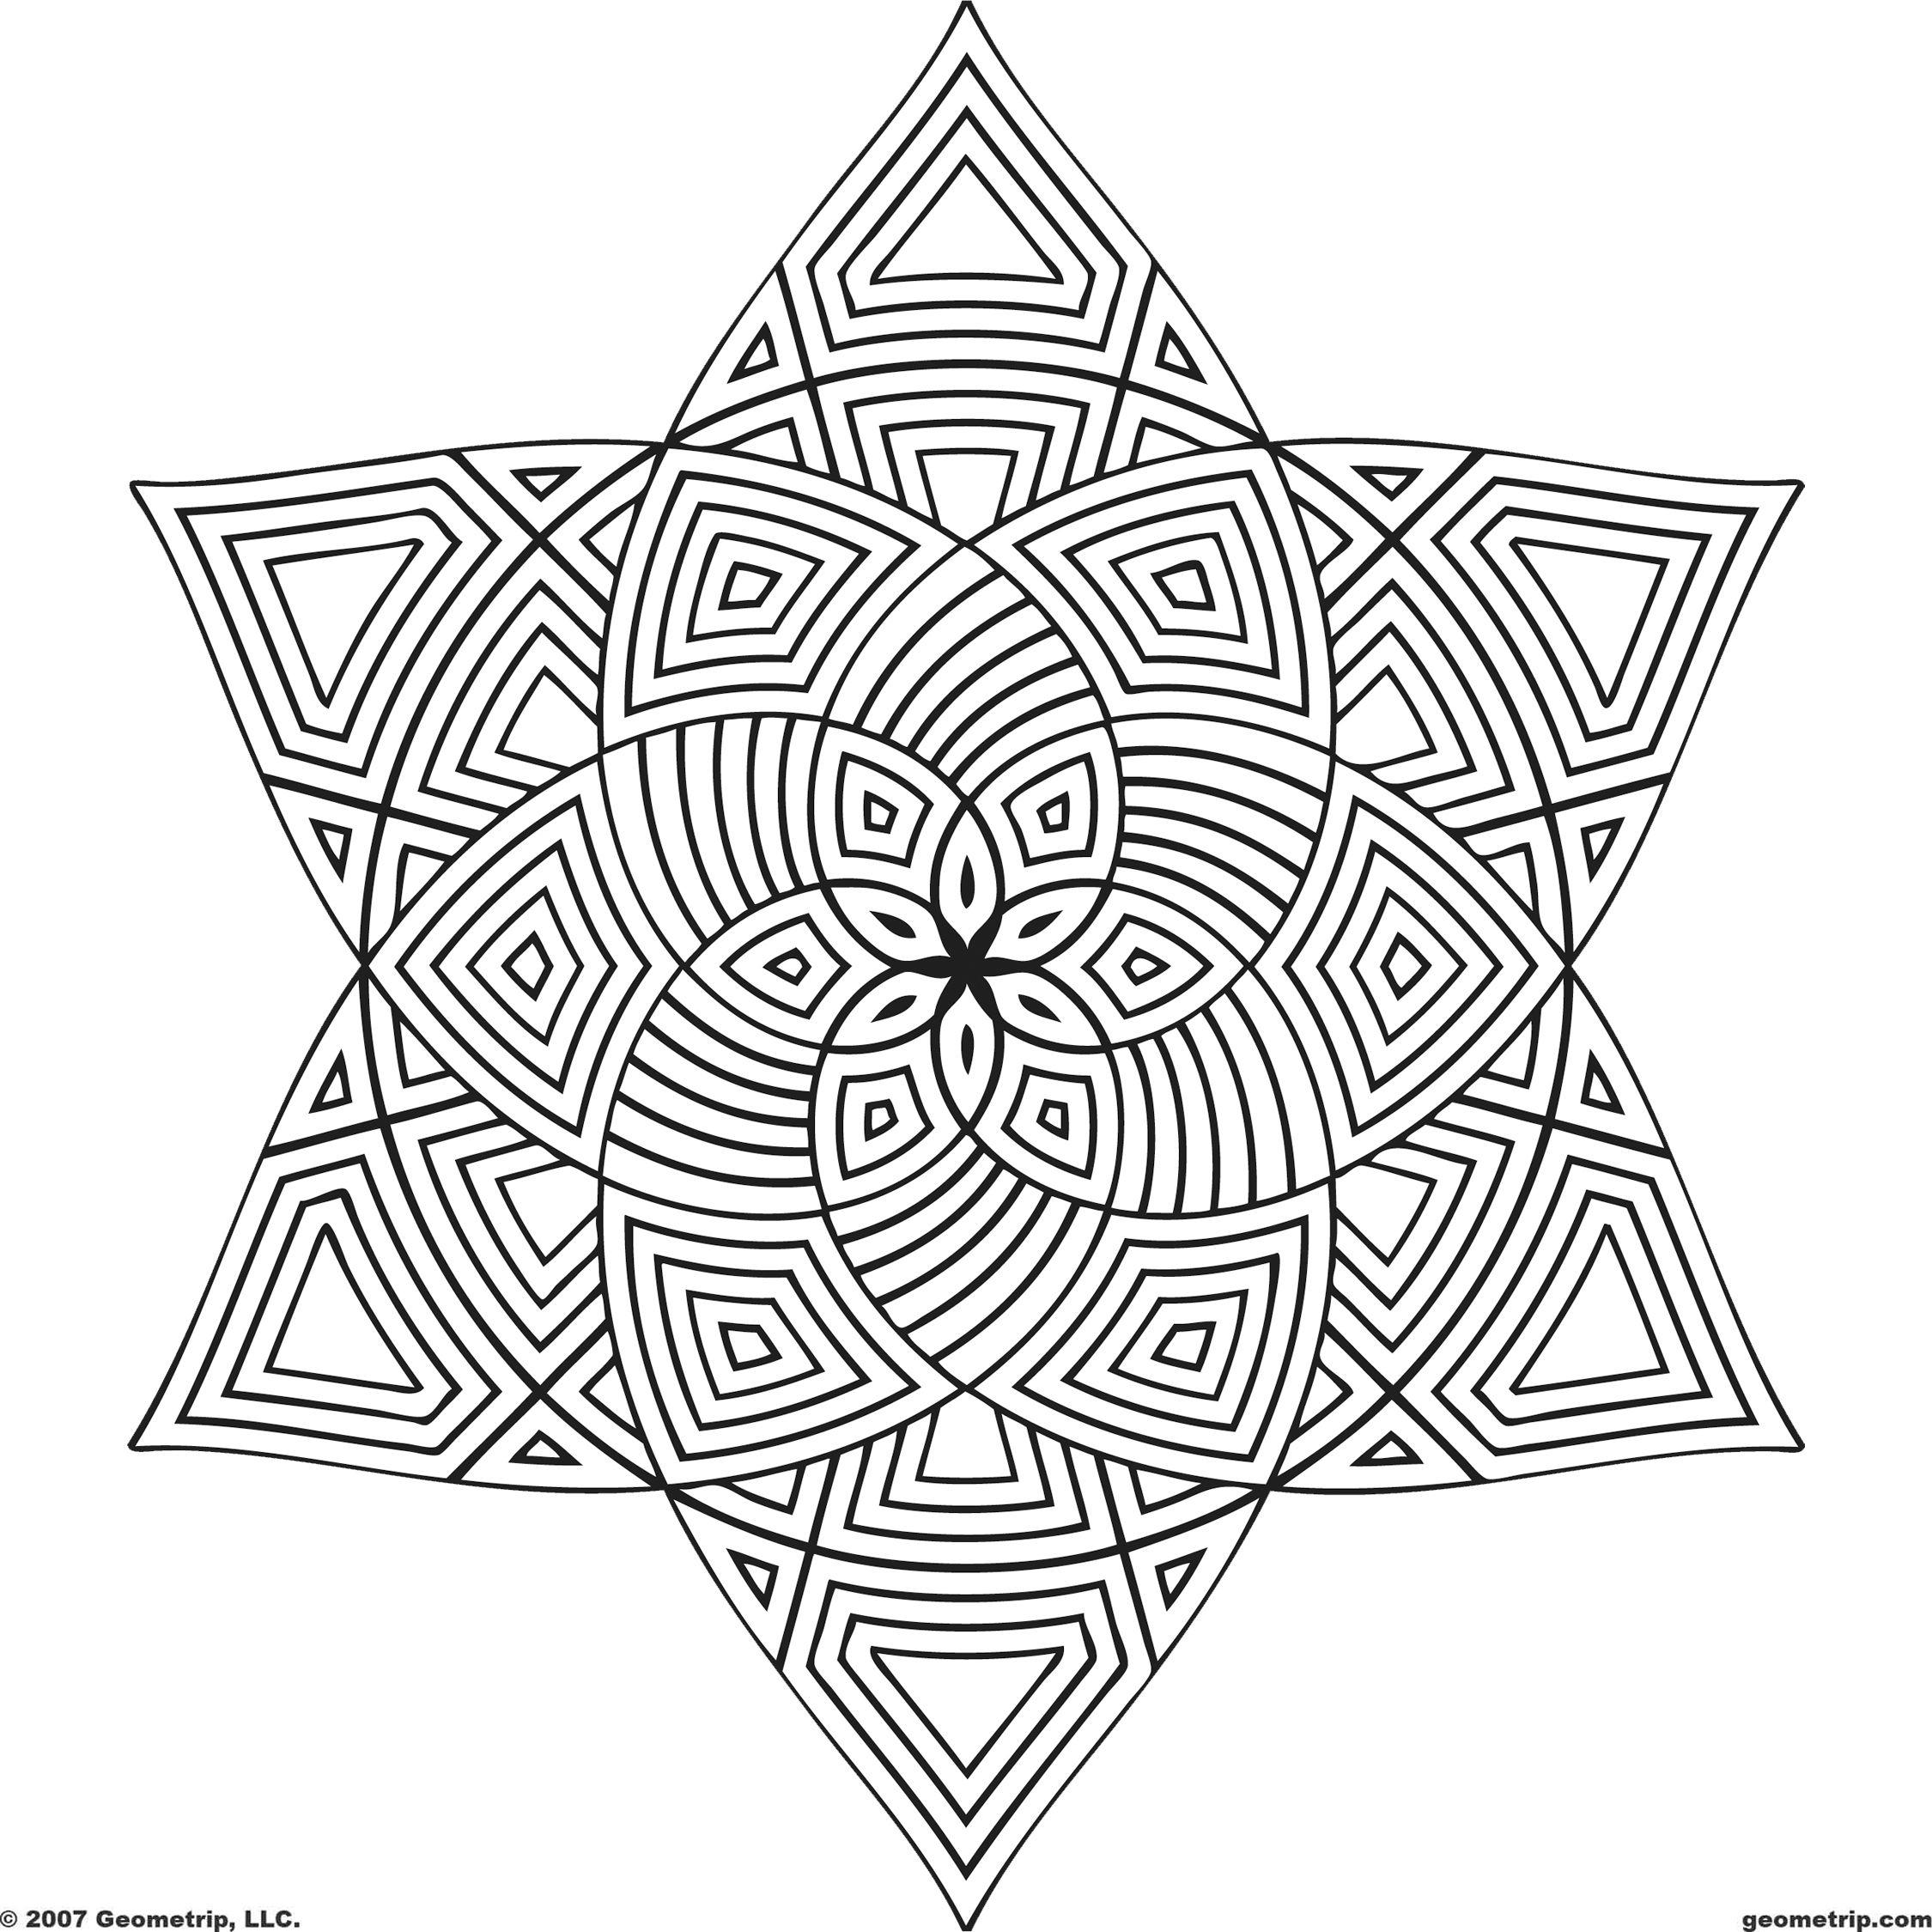 Free Printable Mandala Coloring Pages | Shapes: Page 1 Of 2 - Free Printable Mandala Coloring Pages